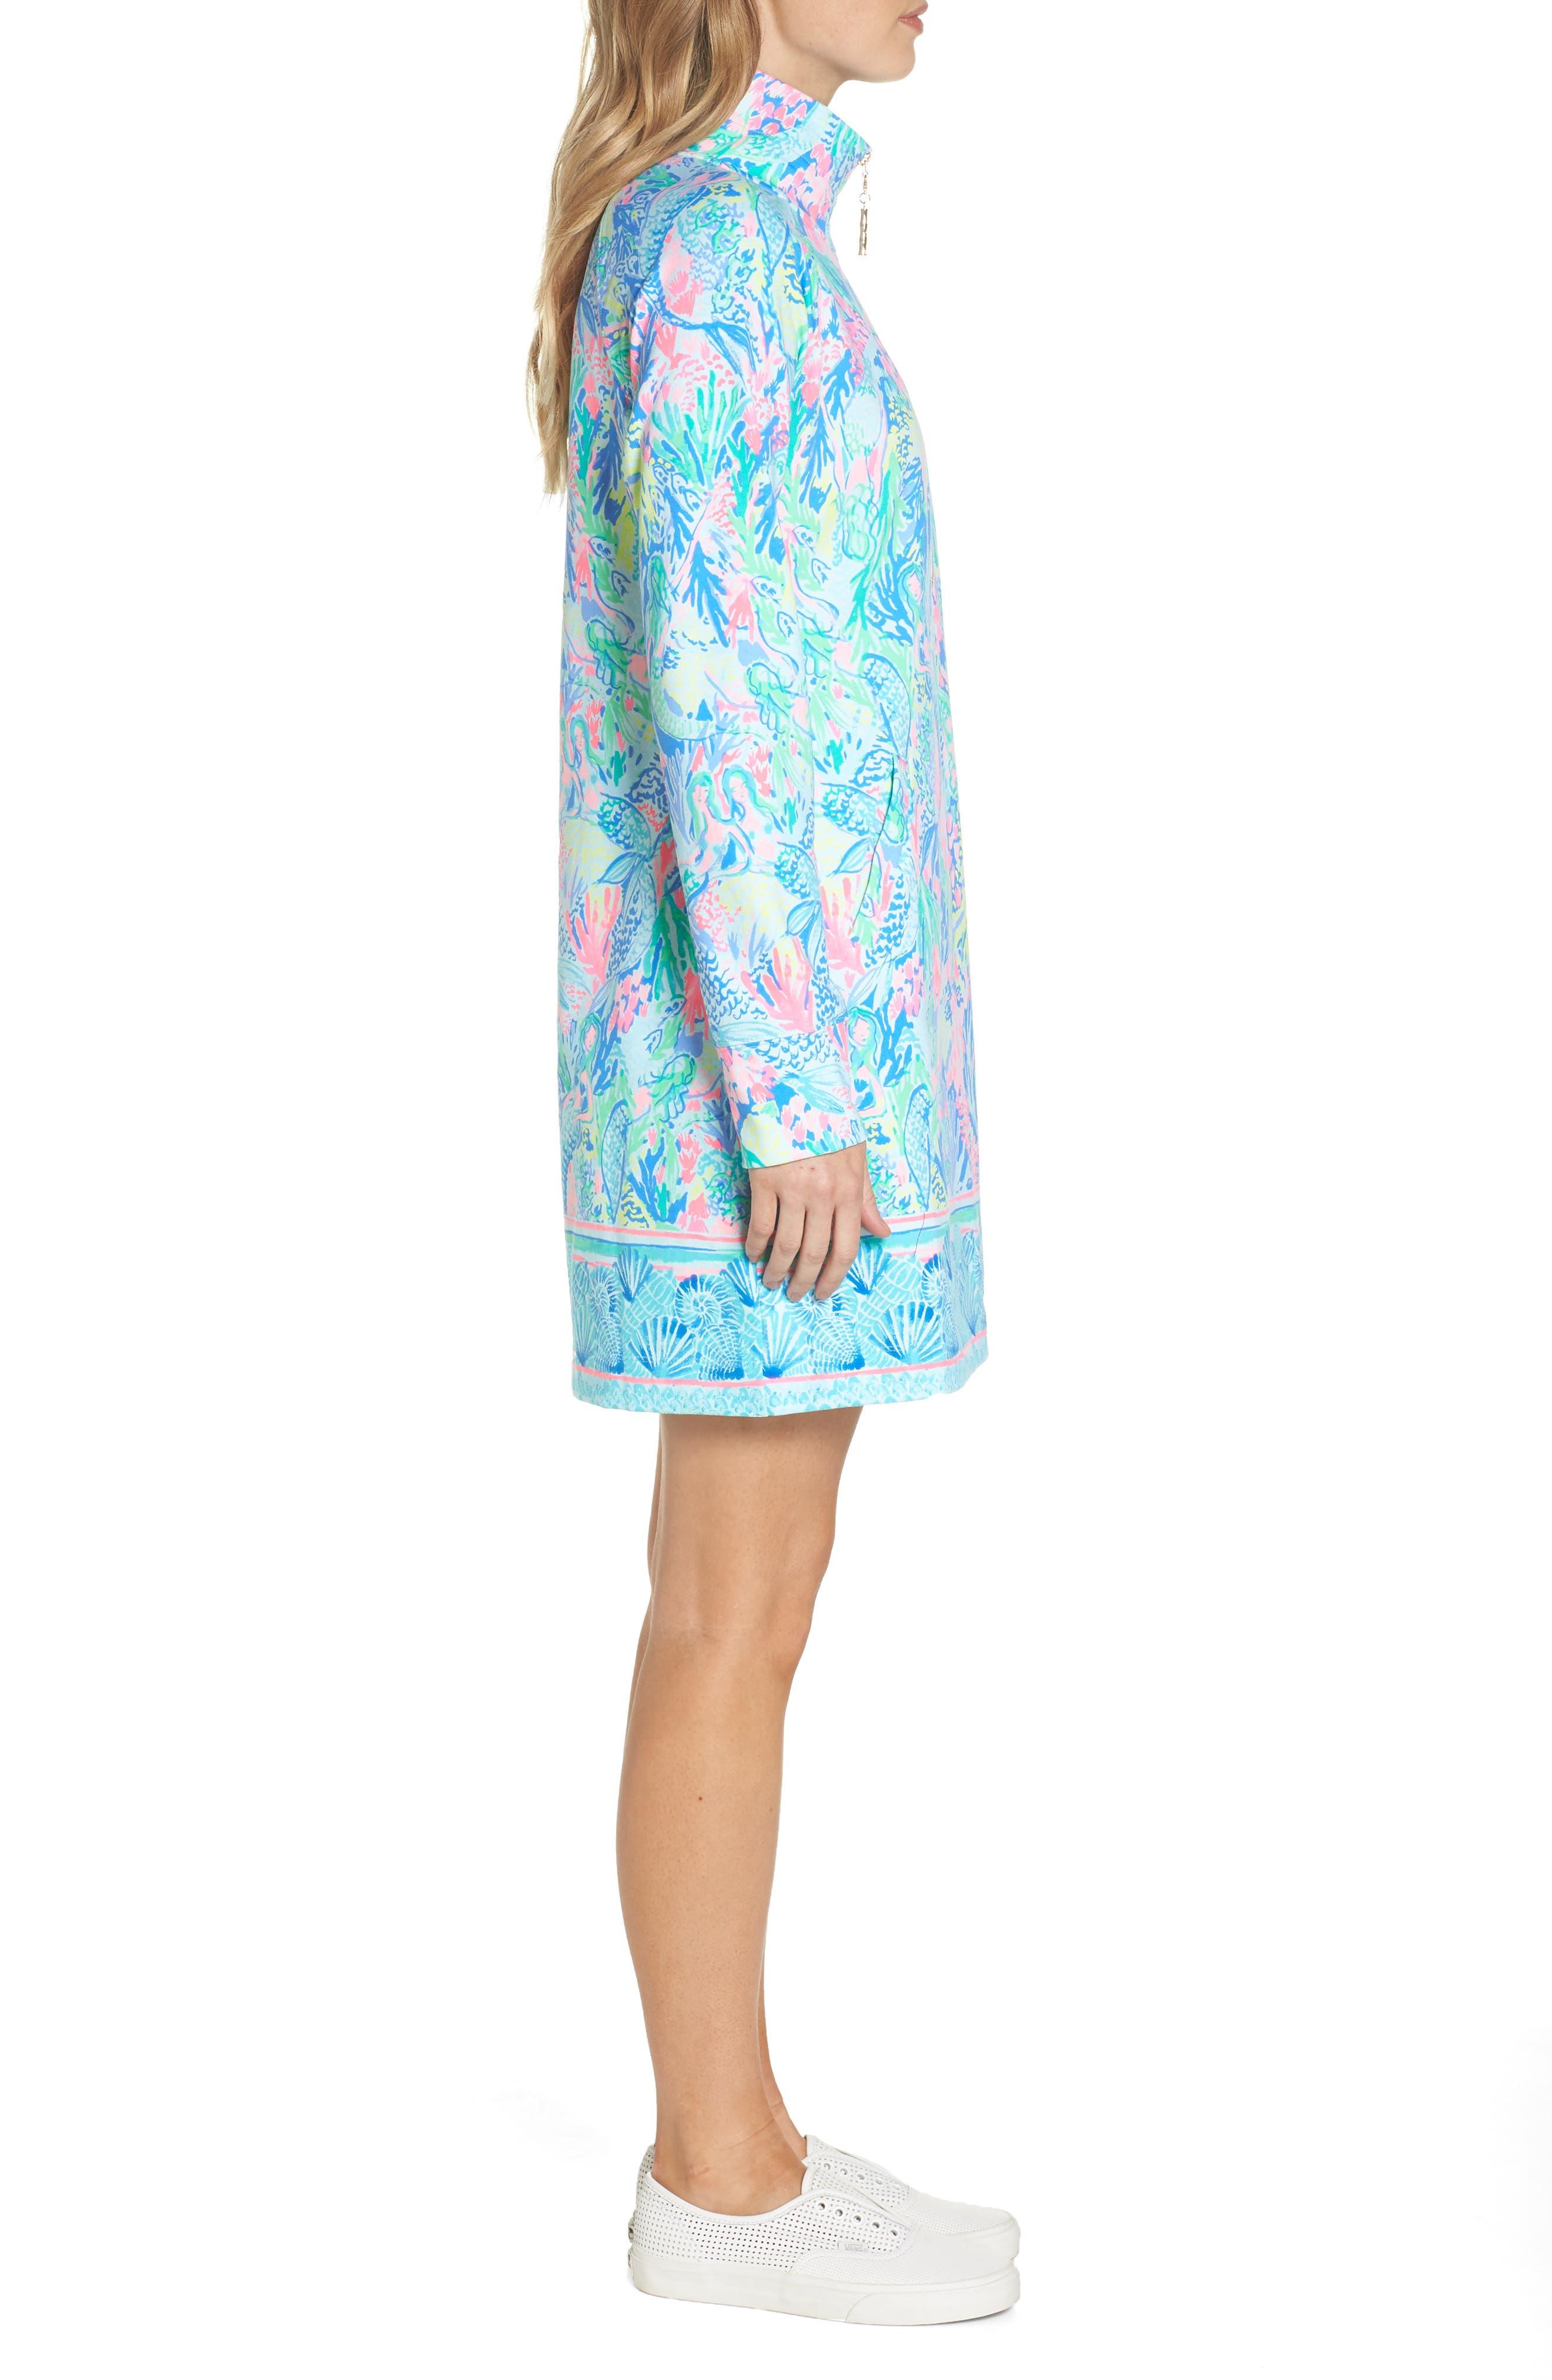 Lilly Pulitzer Skipper Shift Dress,                             Alternate thumbnail 3, color,                             Multi Mermaids Cove